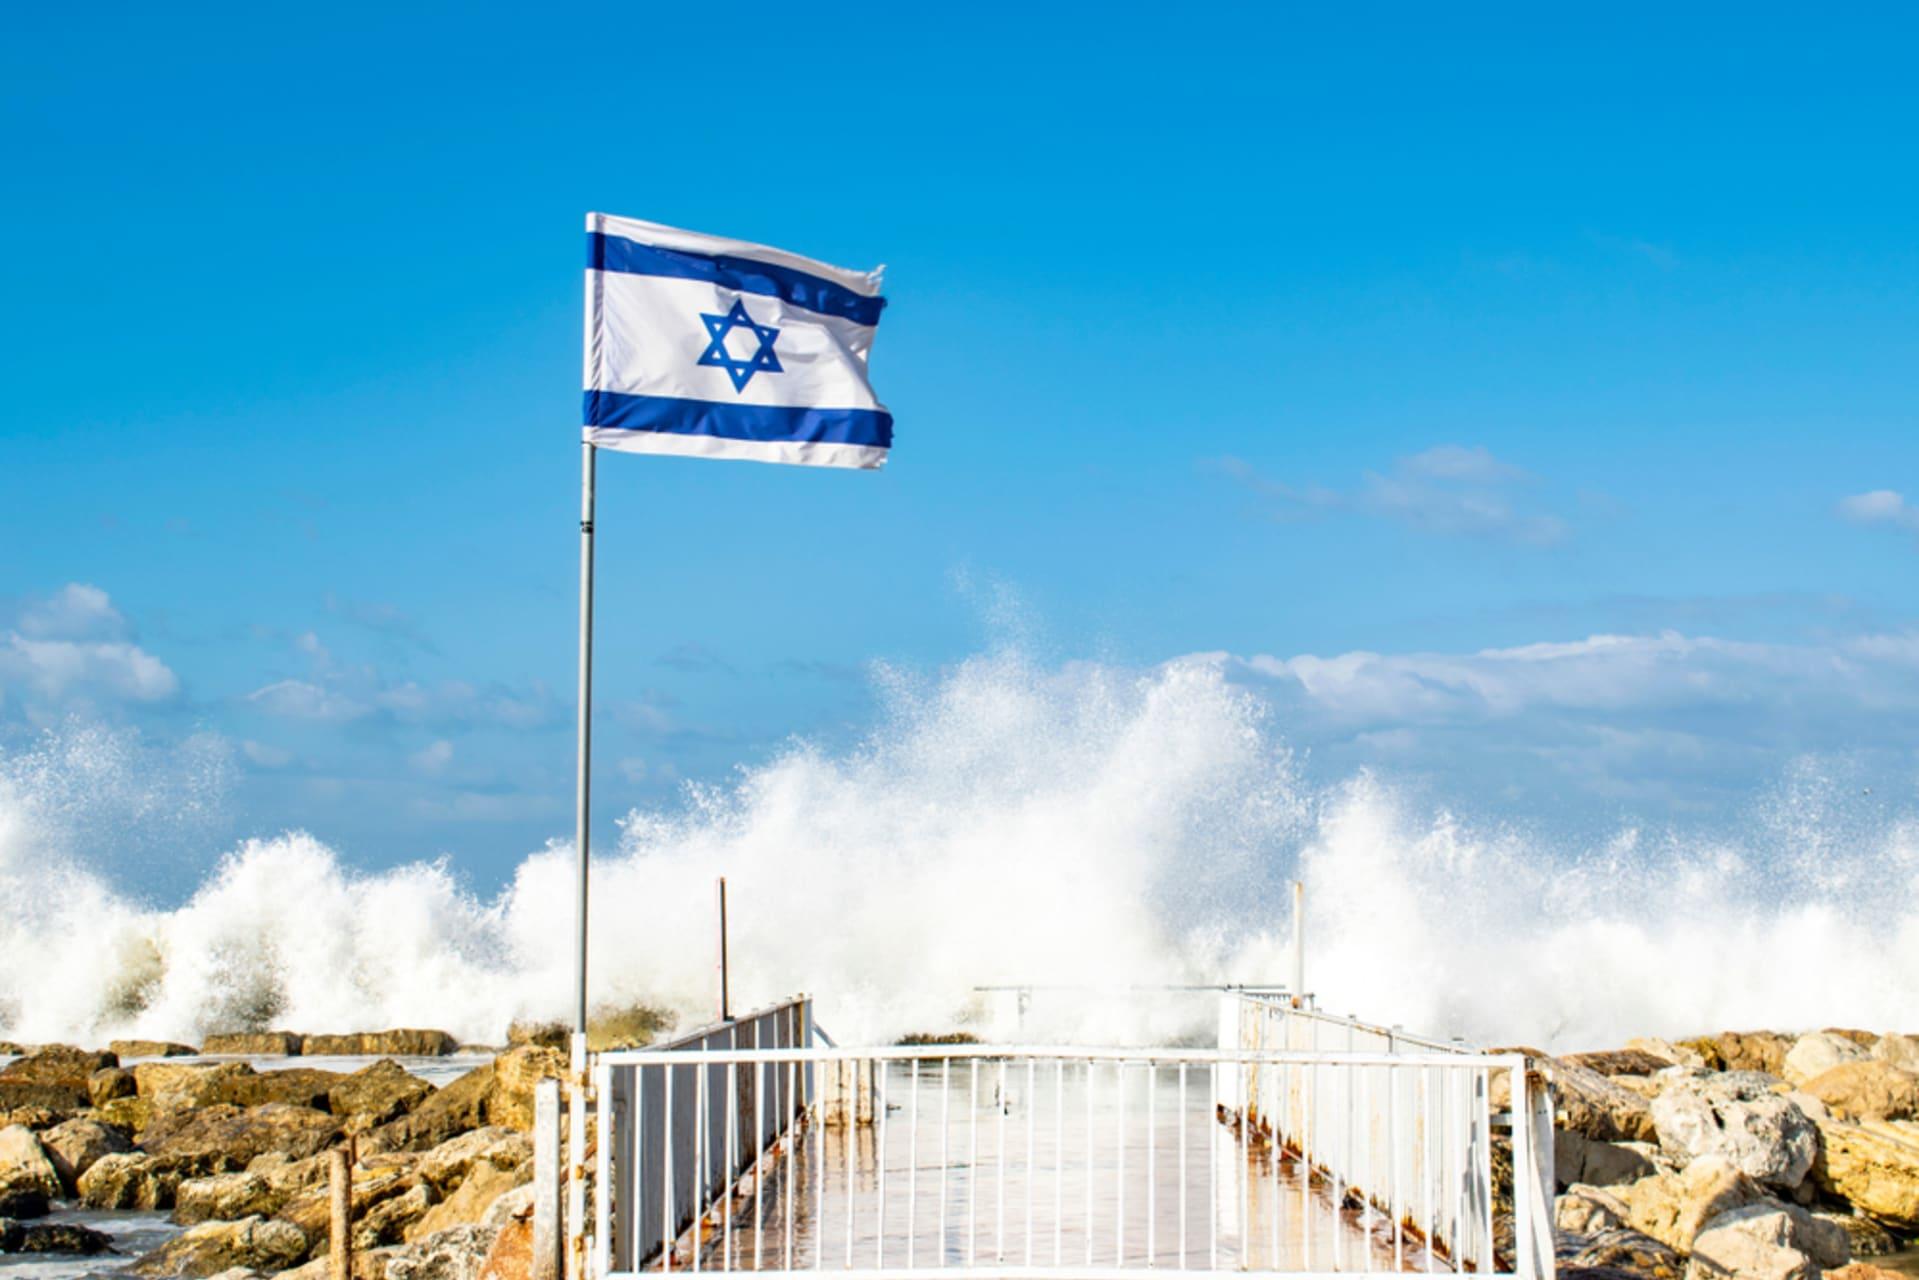 Tel Aviv - The Israel Story - Part I